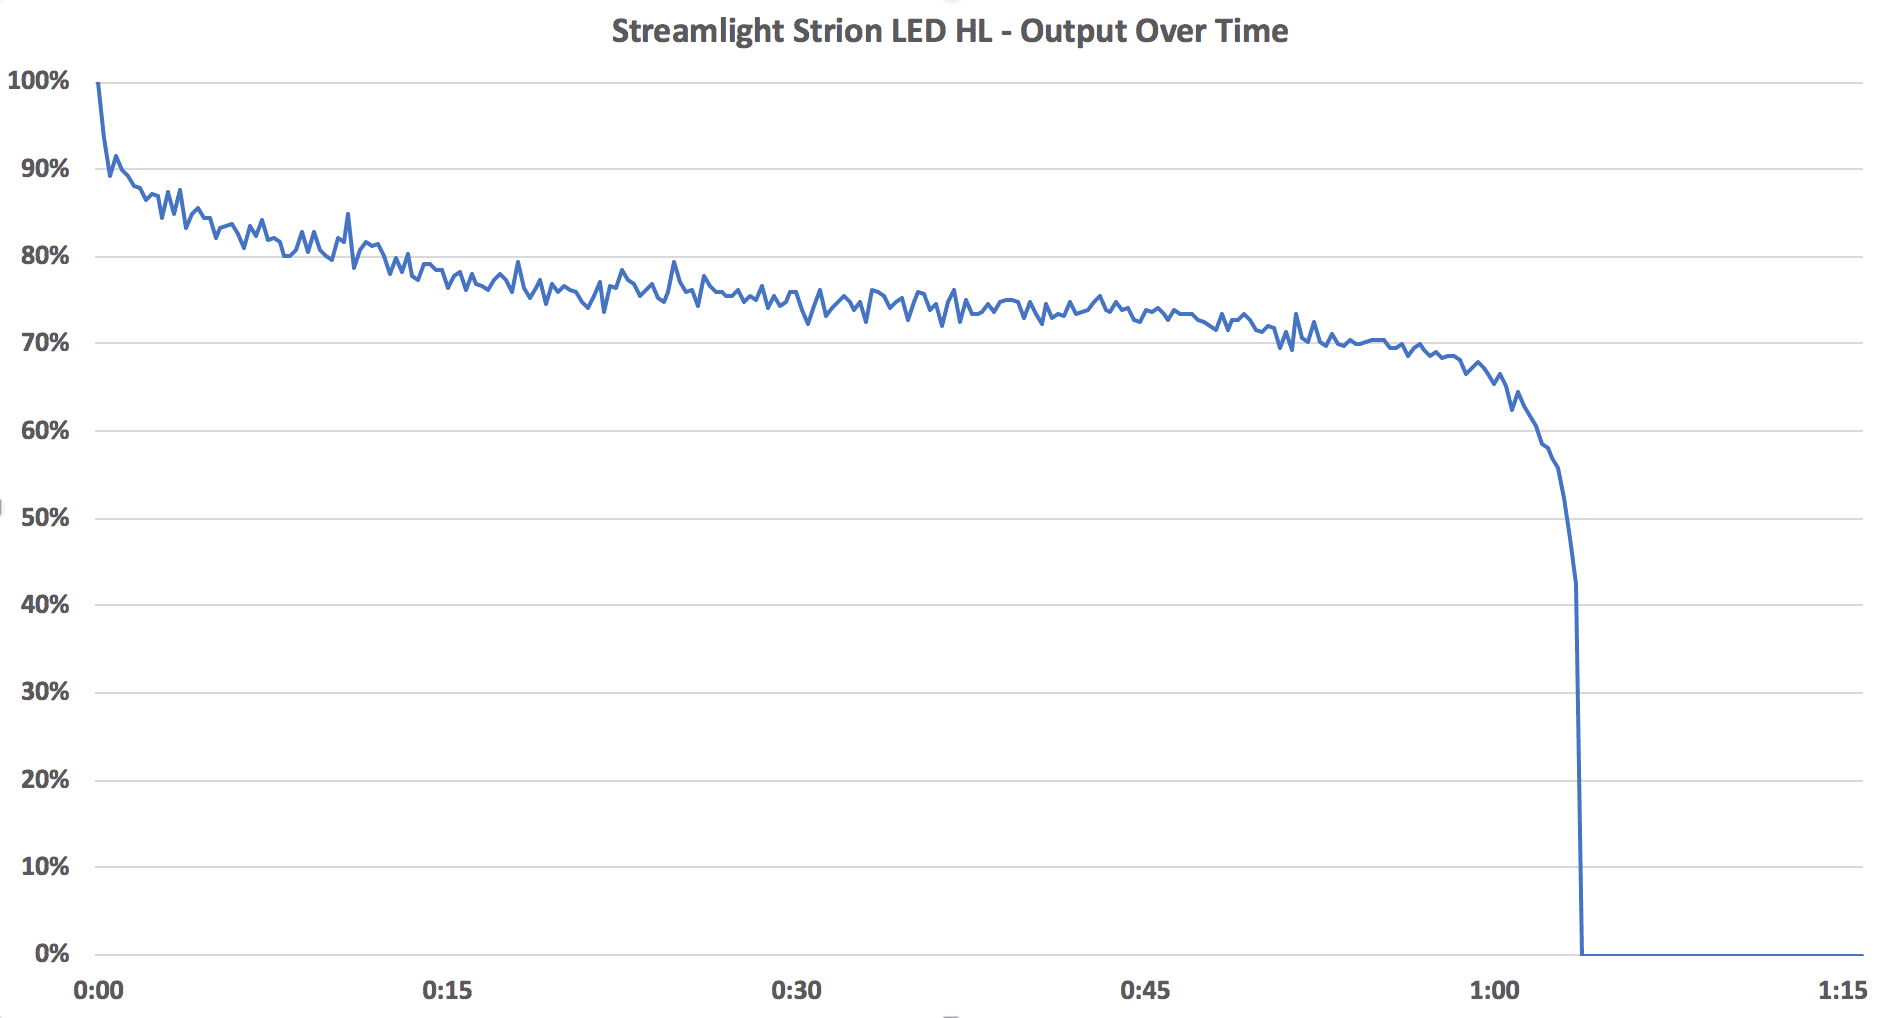 Streamlight Strion LED HL Output Chart